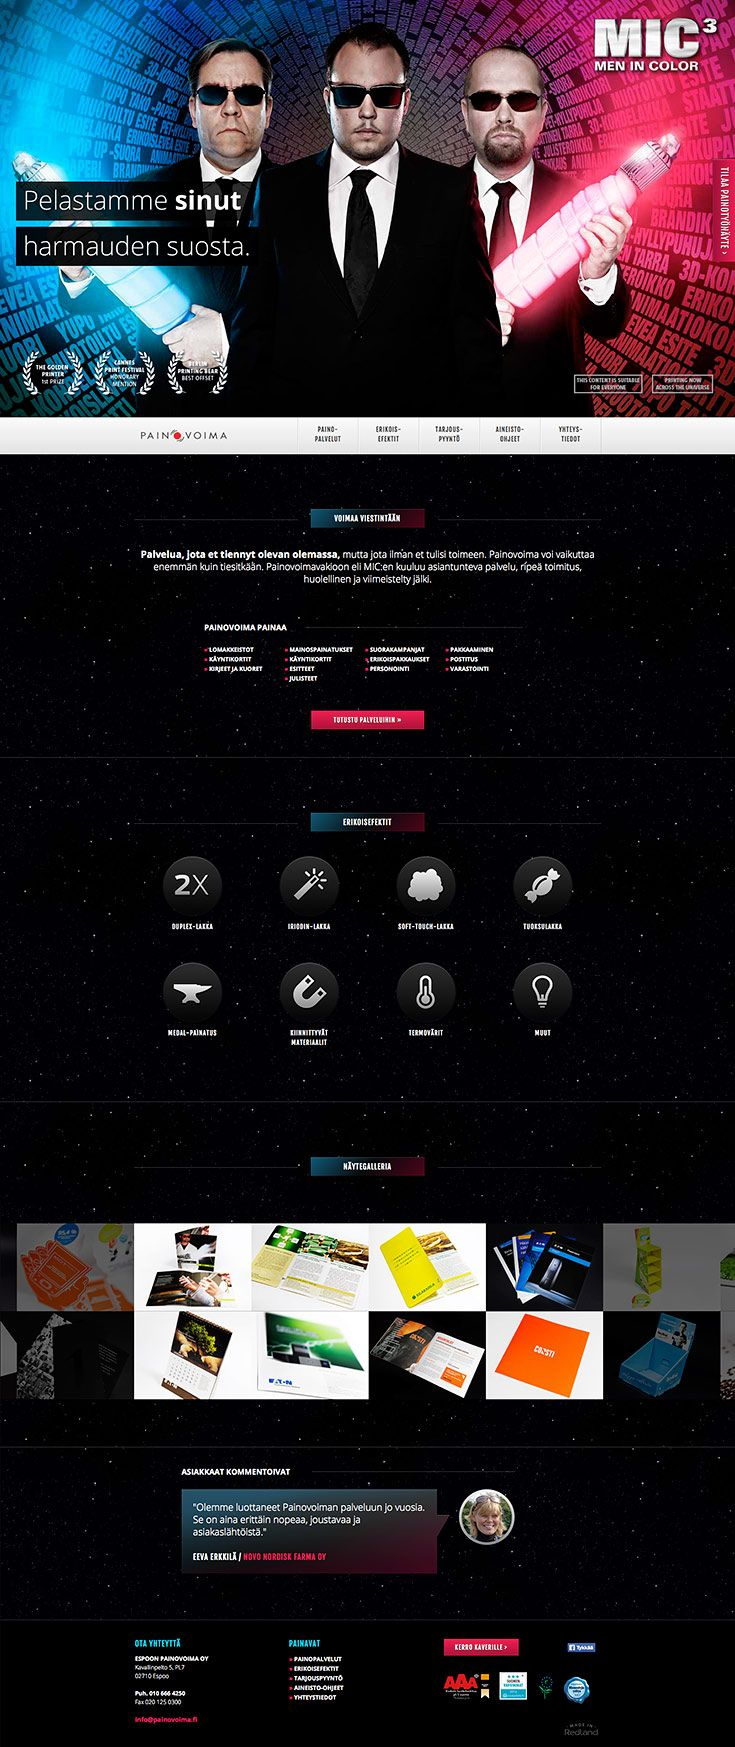 Printing house Painovoima web site upgrade to their new Men in Color III -theme.  http://www.redland.fi/painovoima-verkkosivuston-uudistus/